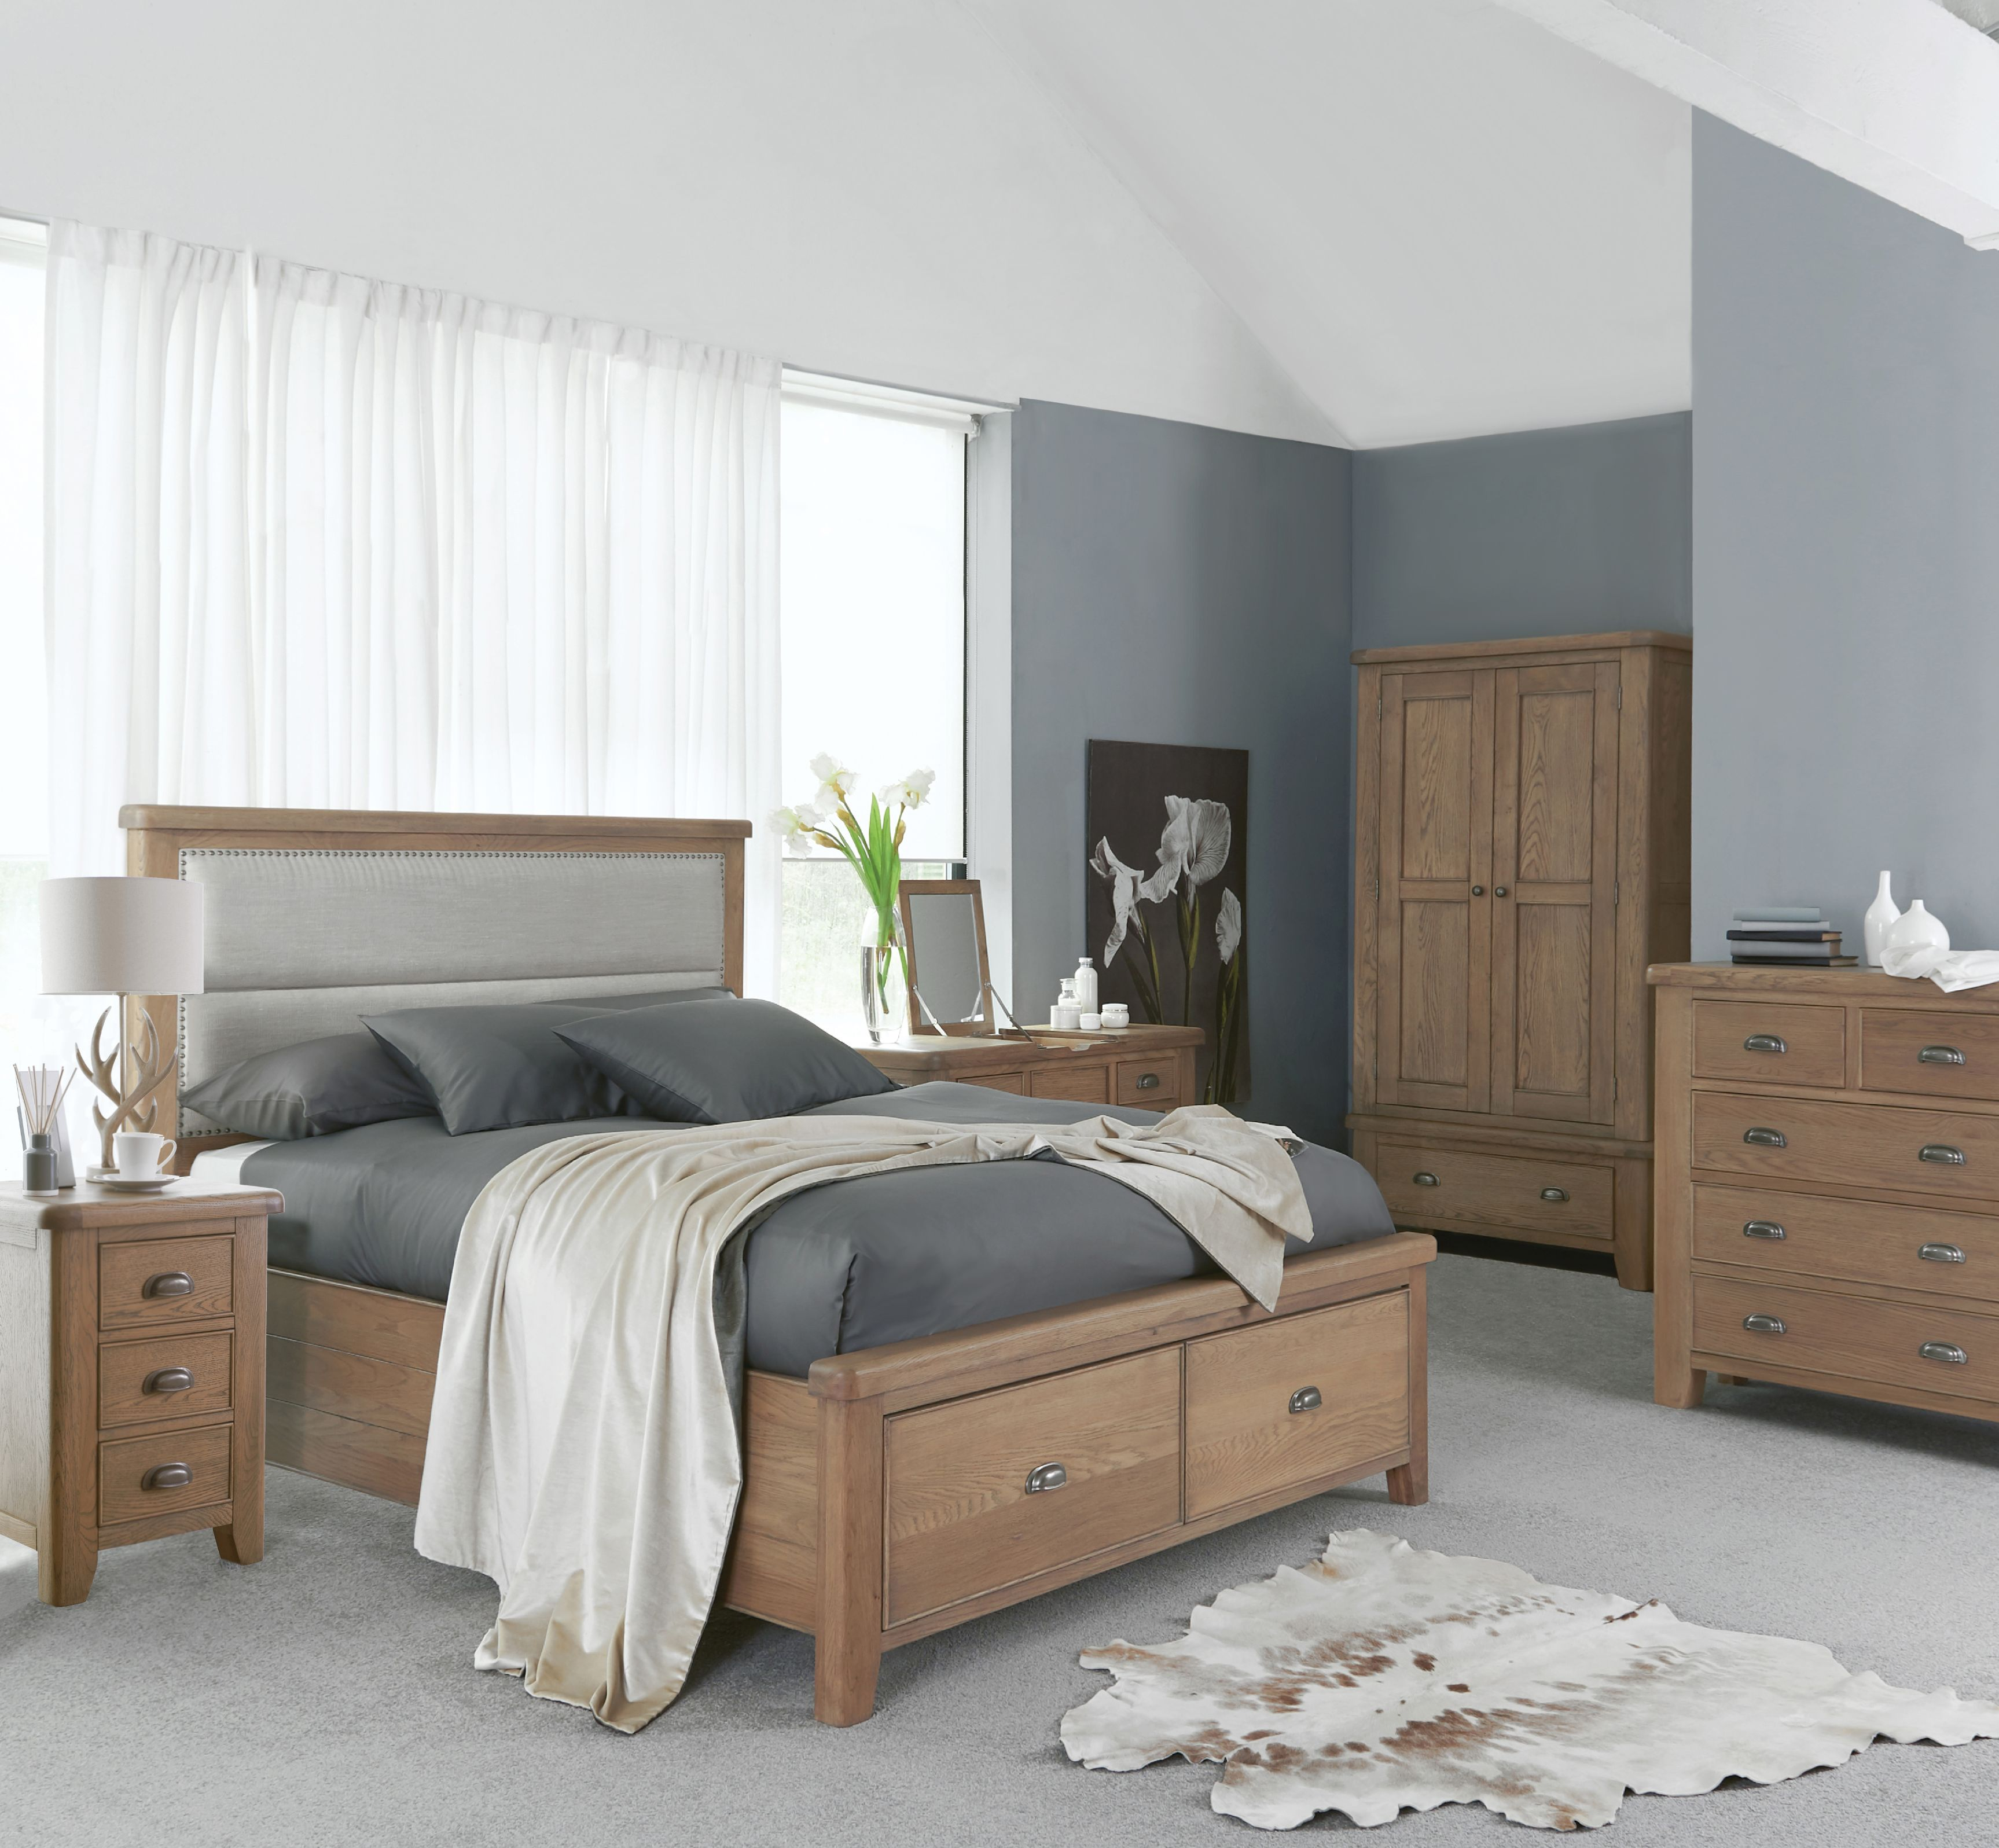 Kettle Interiors - HOULGATE - Bedroom